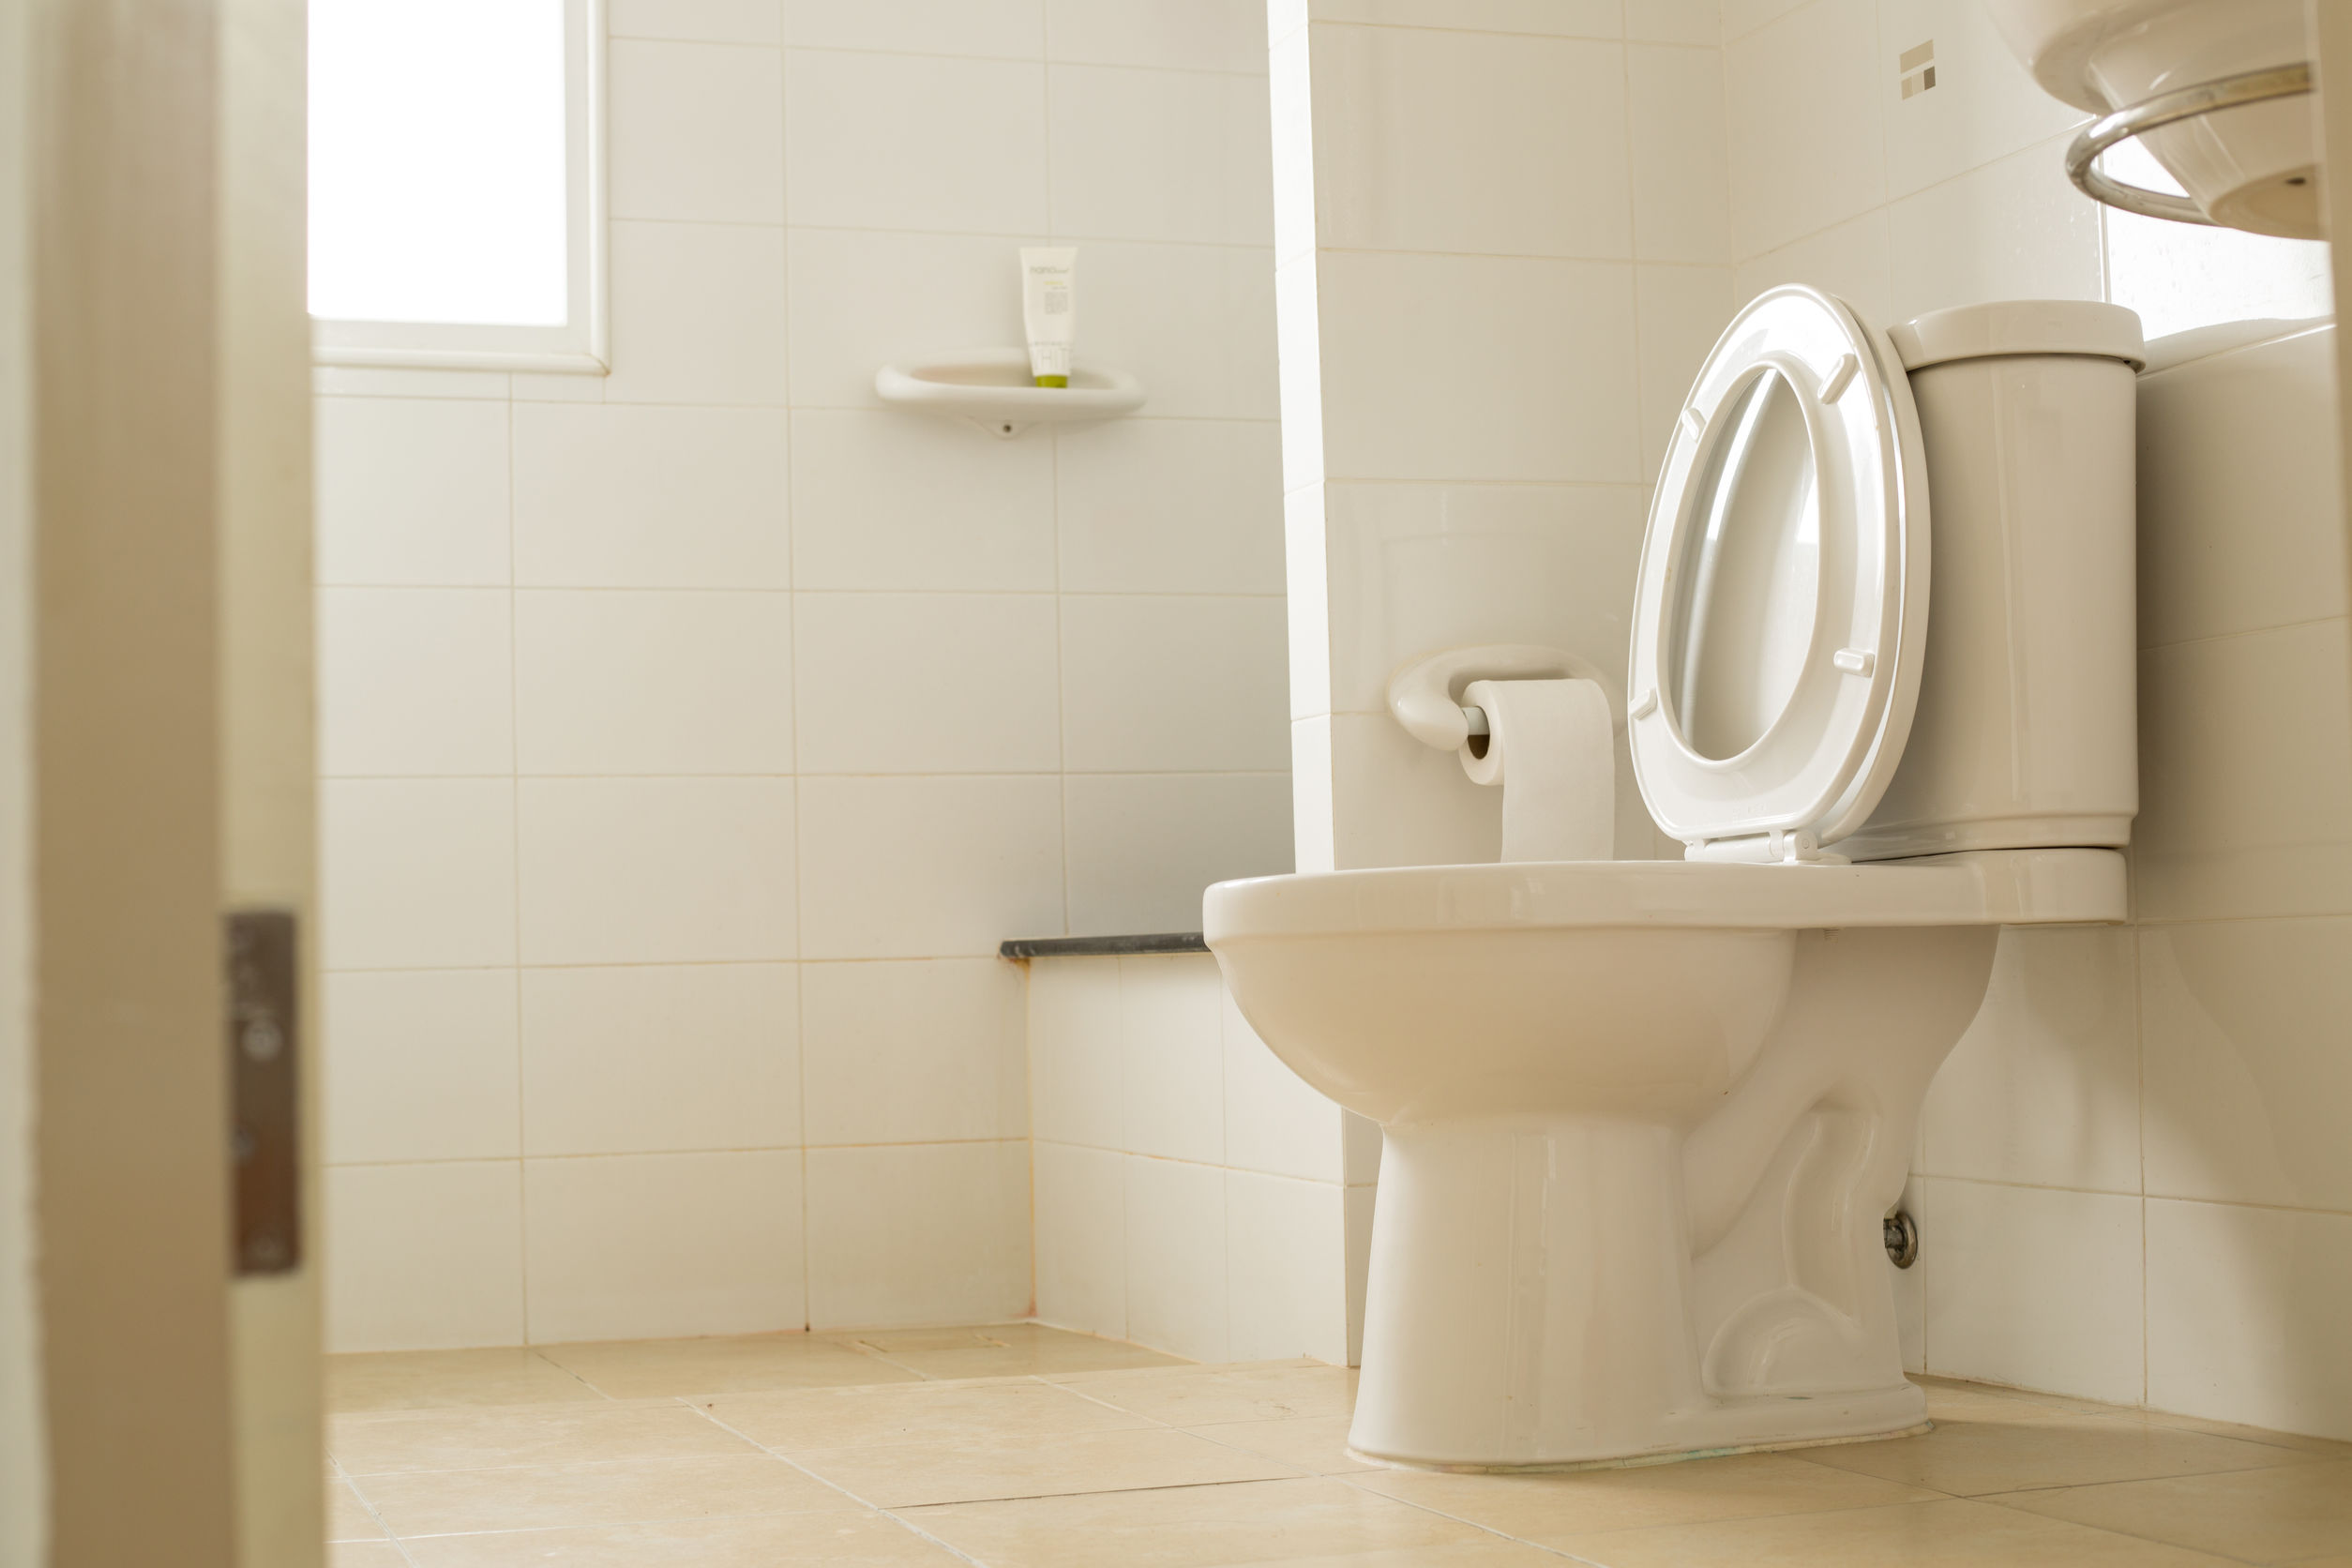 WC Deckel